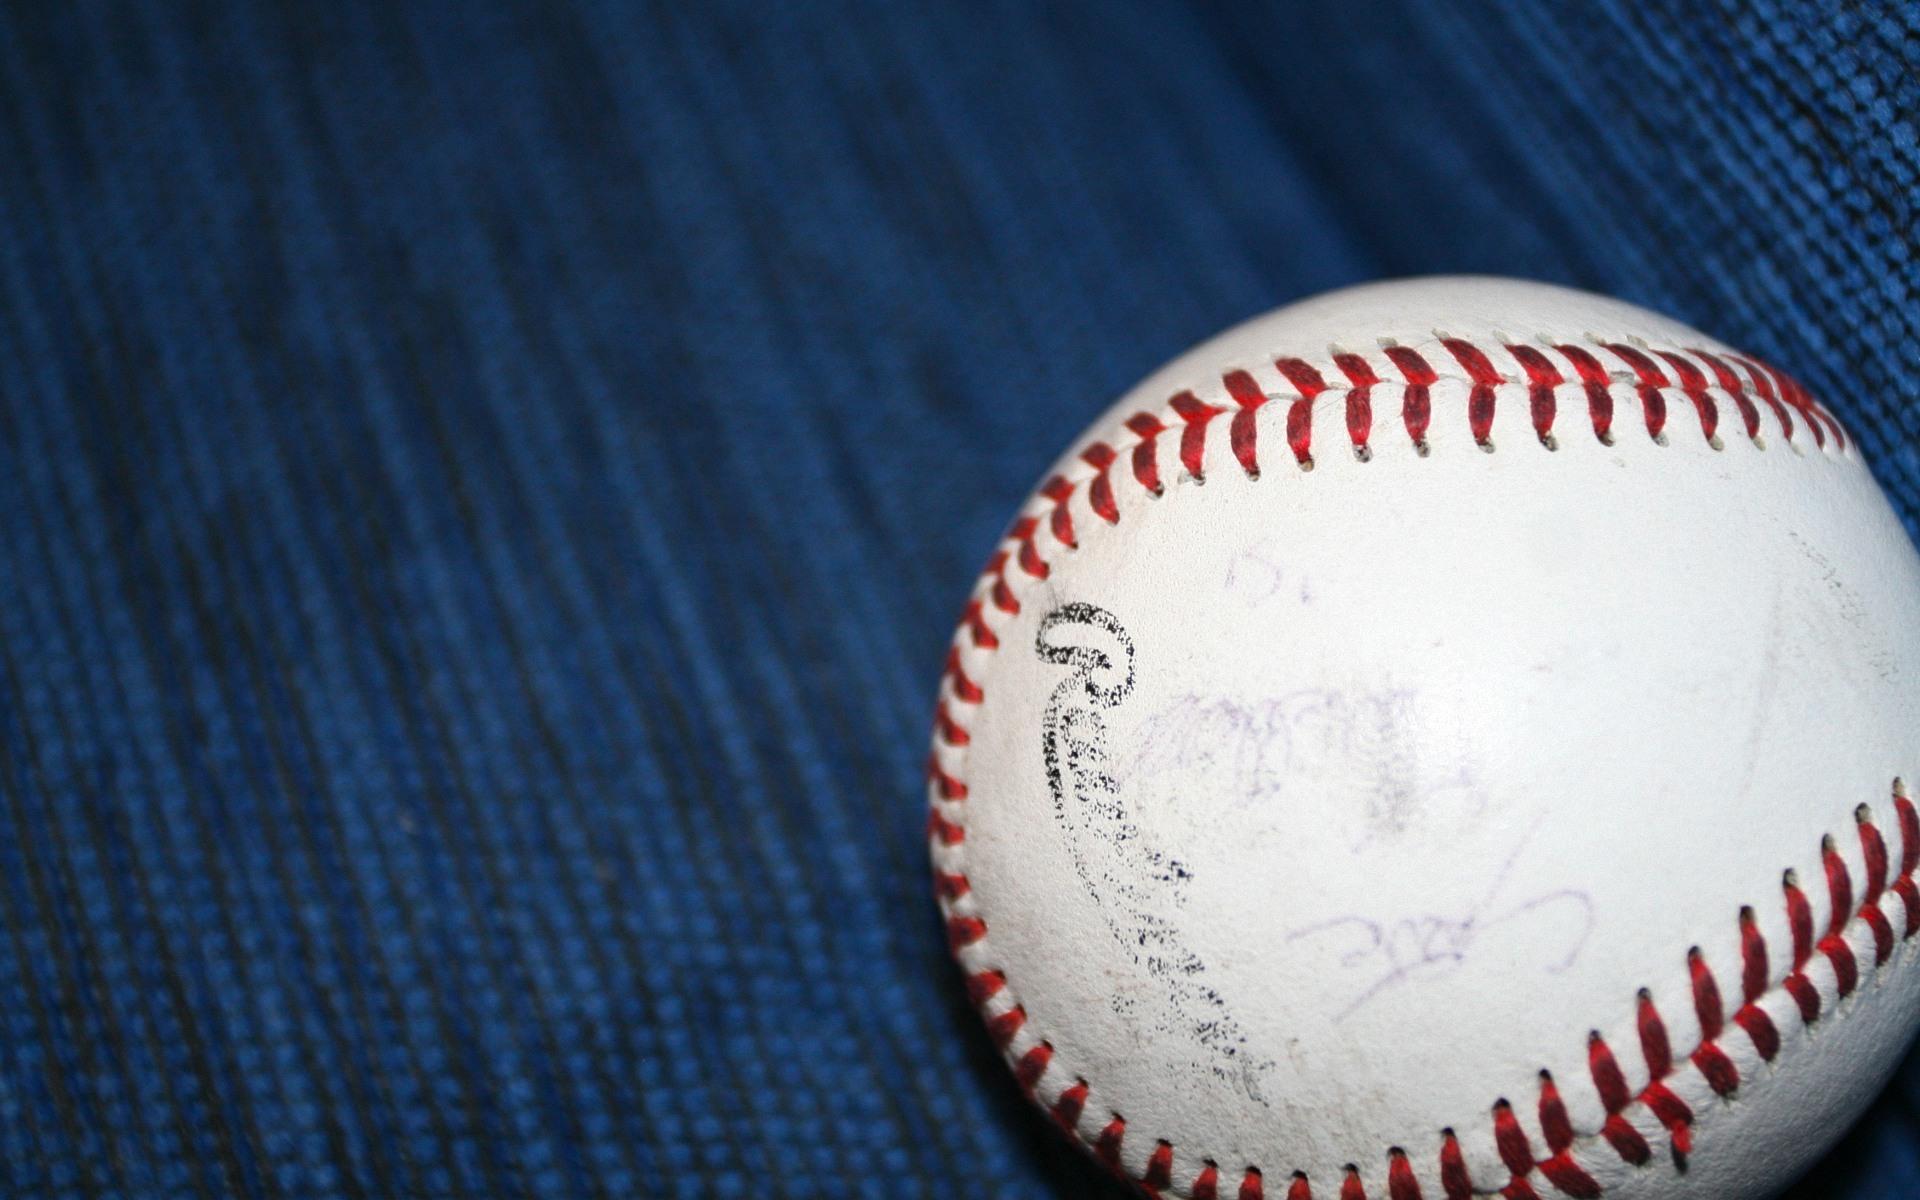 Baseball Wallpaper 1898 1920 x 1200   WallpaperLayercom 1920x1200